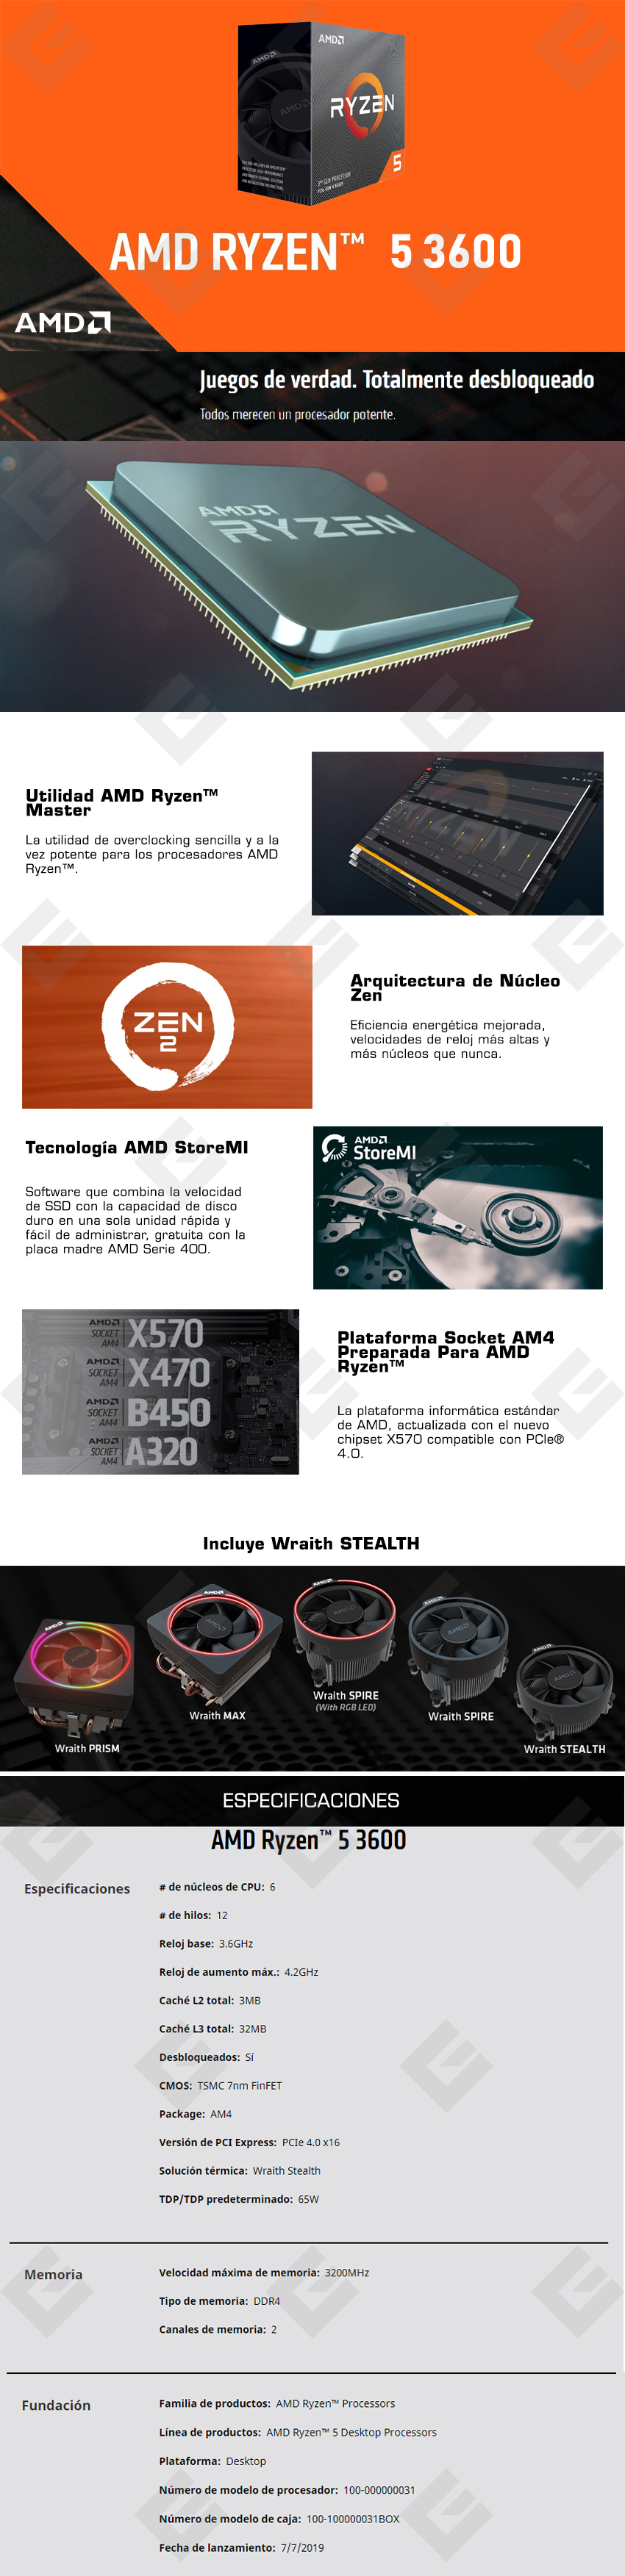 Procesador AMD Ryzen 5 3600, 6 Cores, 12 Threads, 3.6Ghz Base, 4.2Ghz Max, Socket AM4, Wraith Stealth